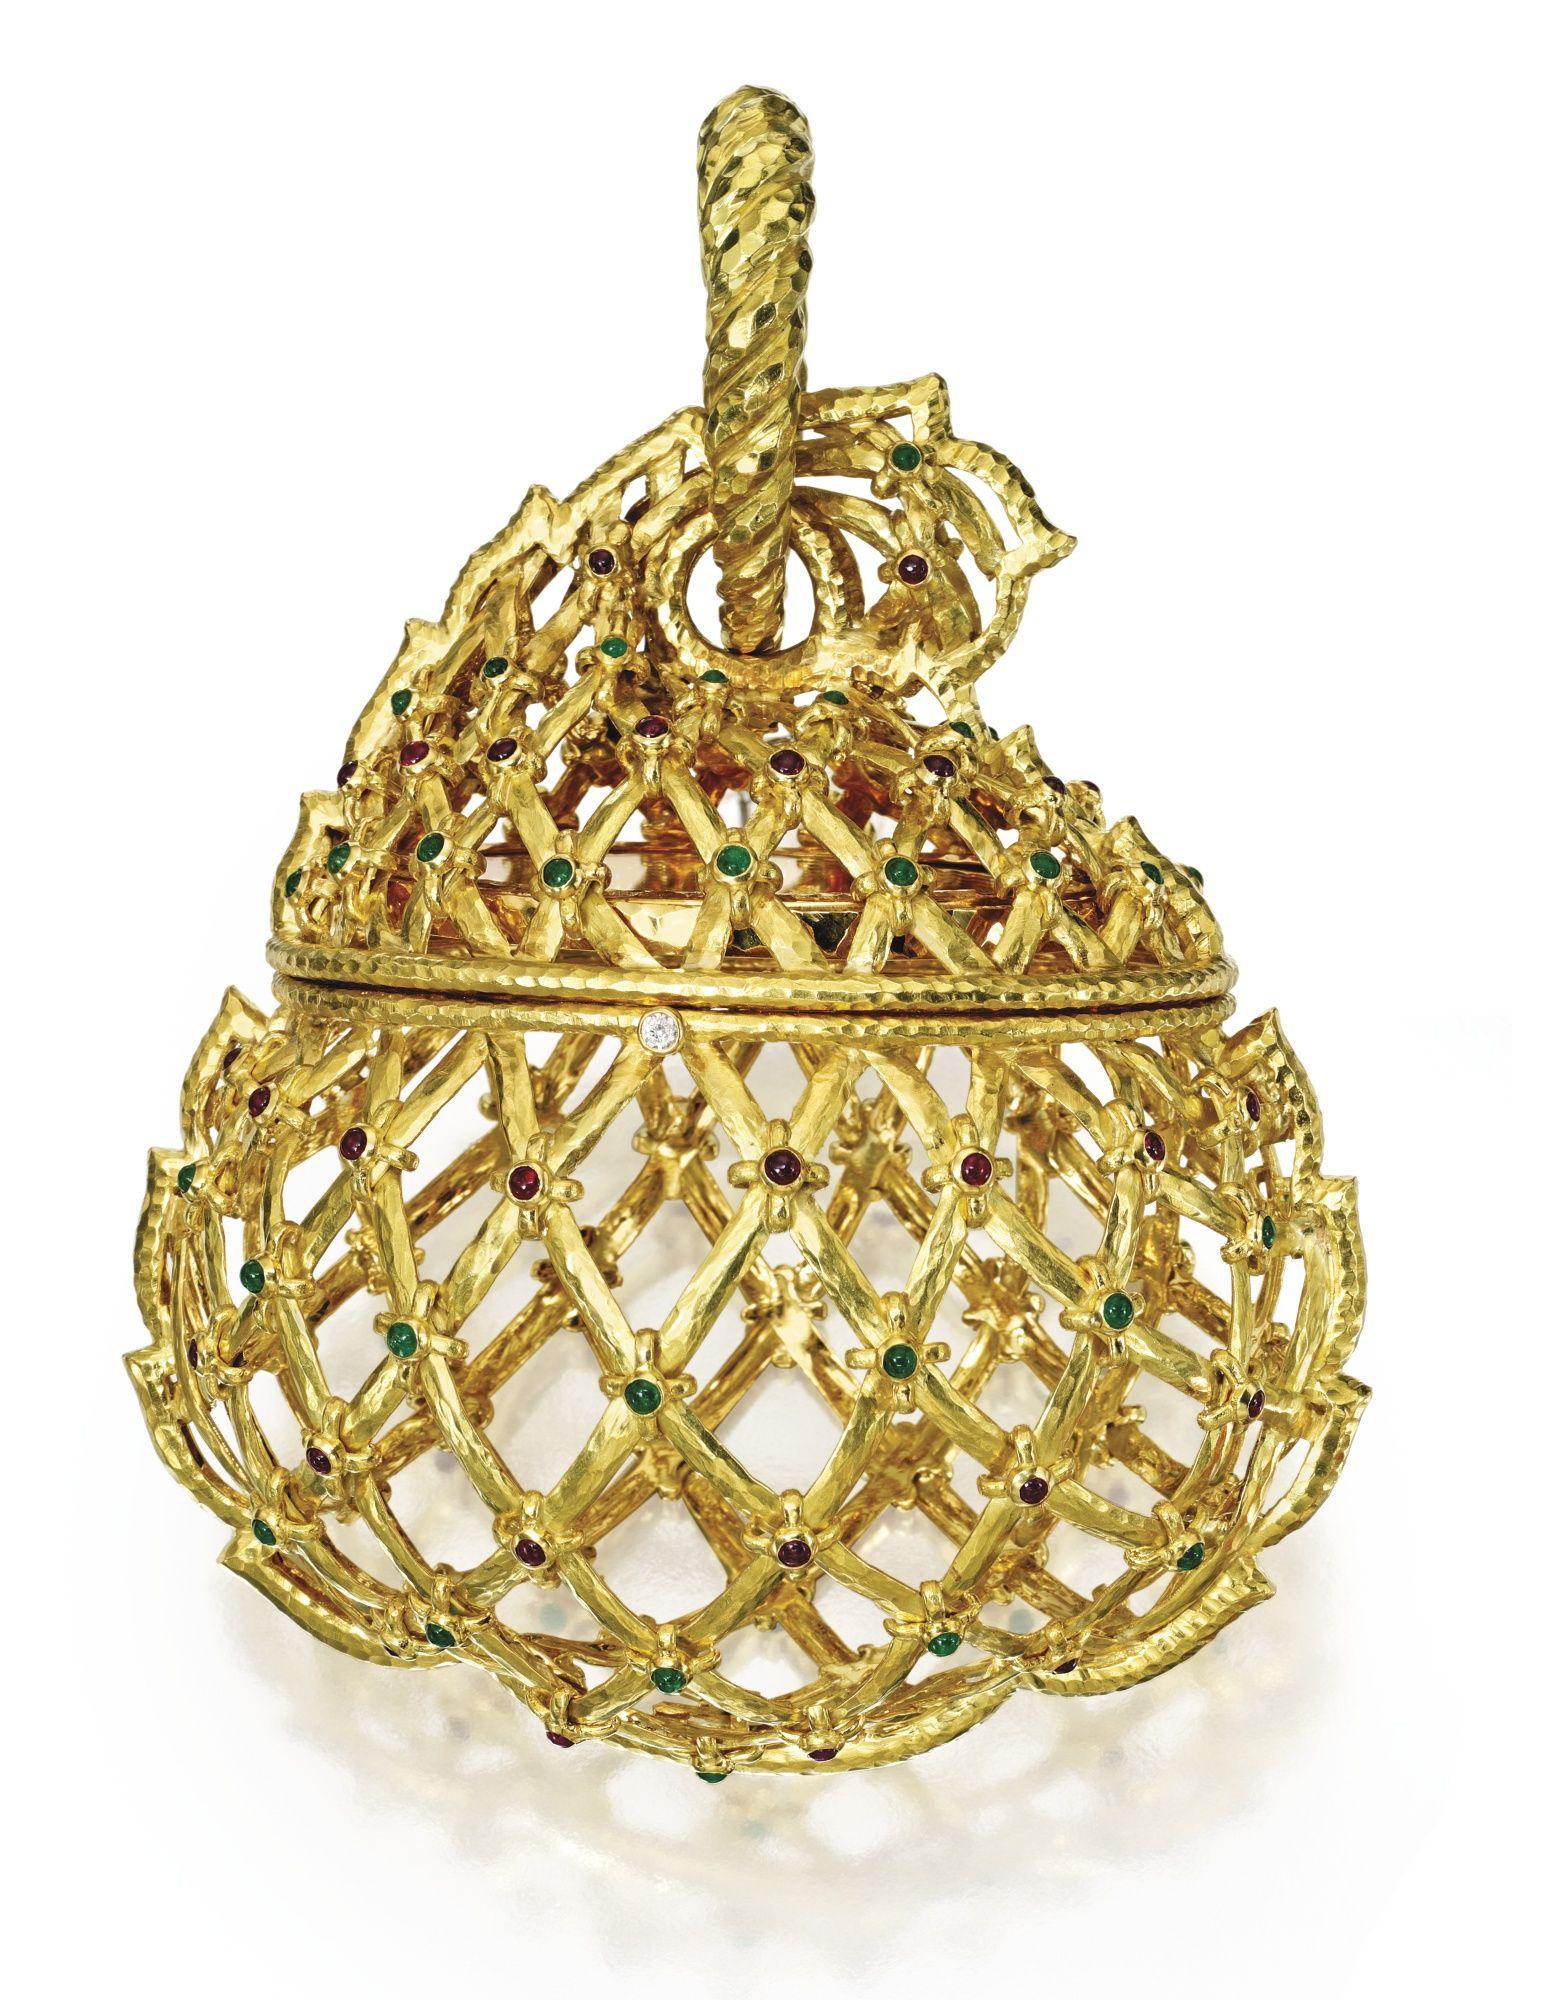 karat gold ruby emerald and diamond evening bag david webb